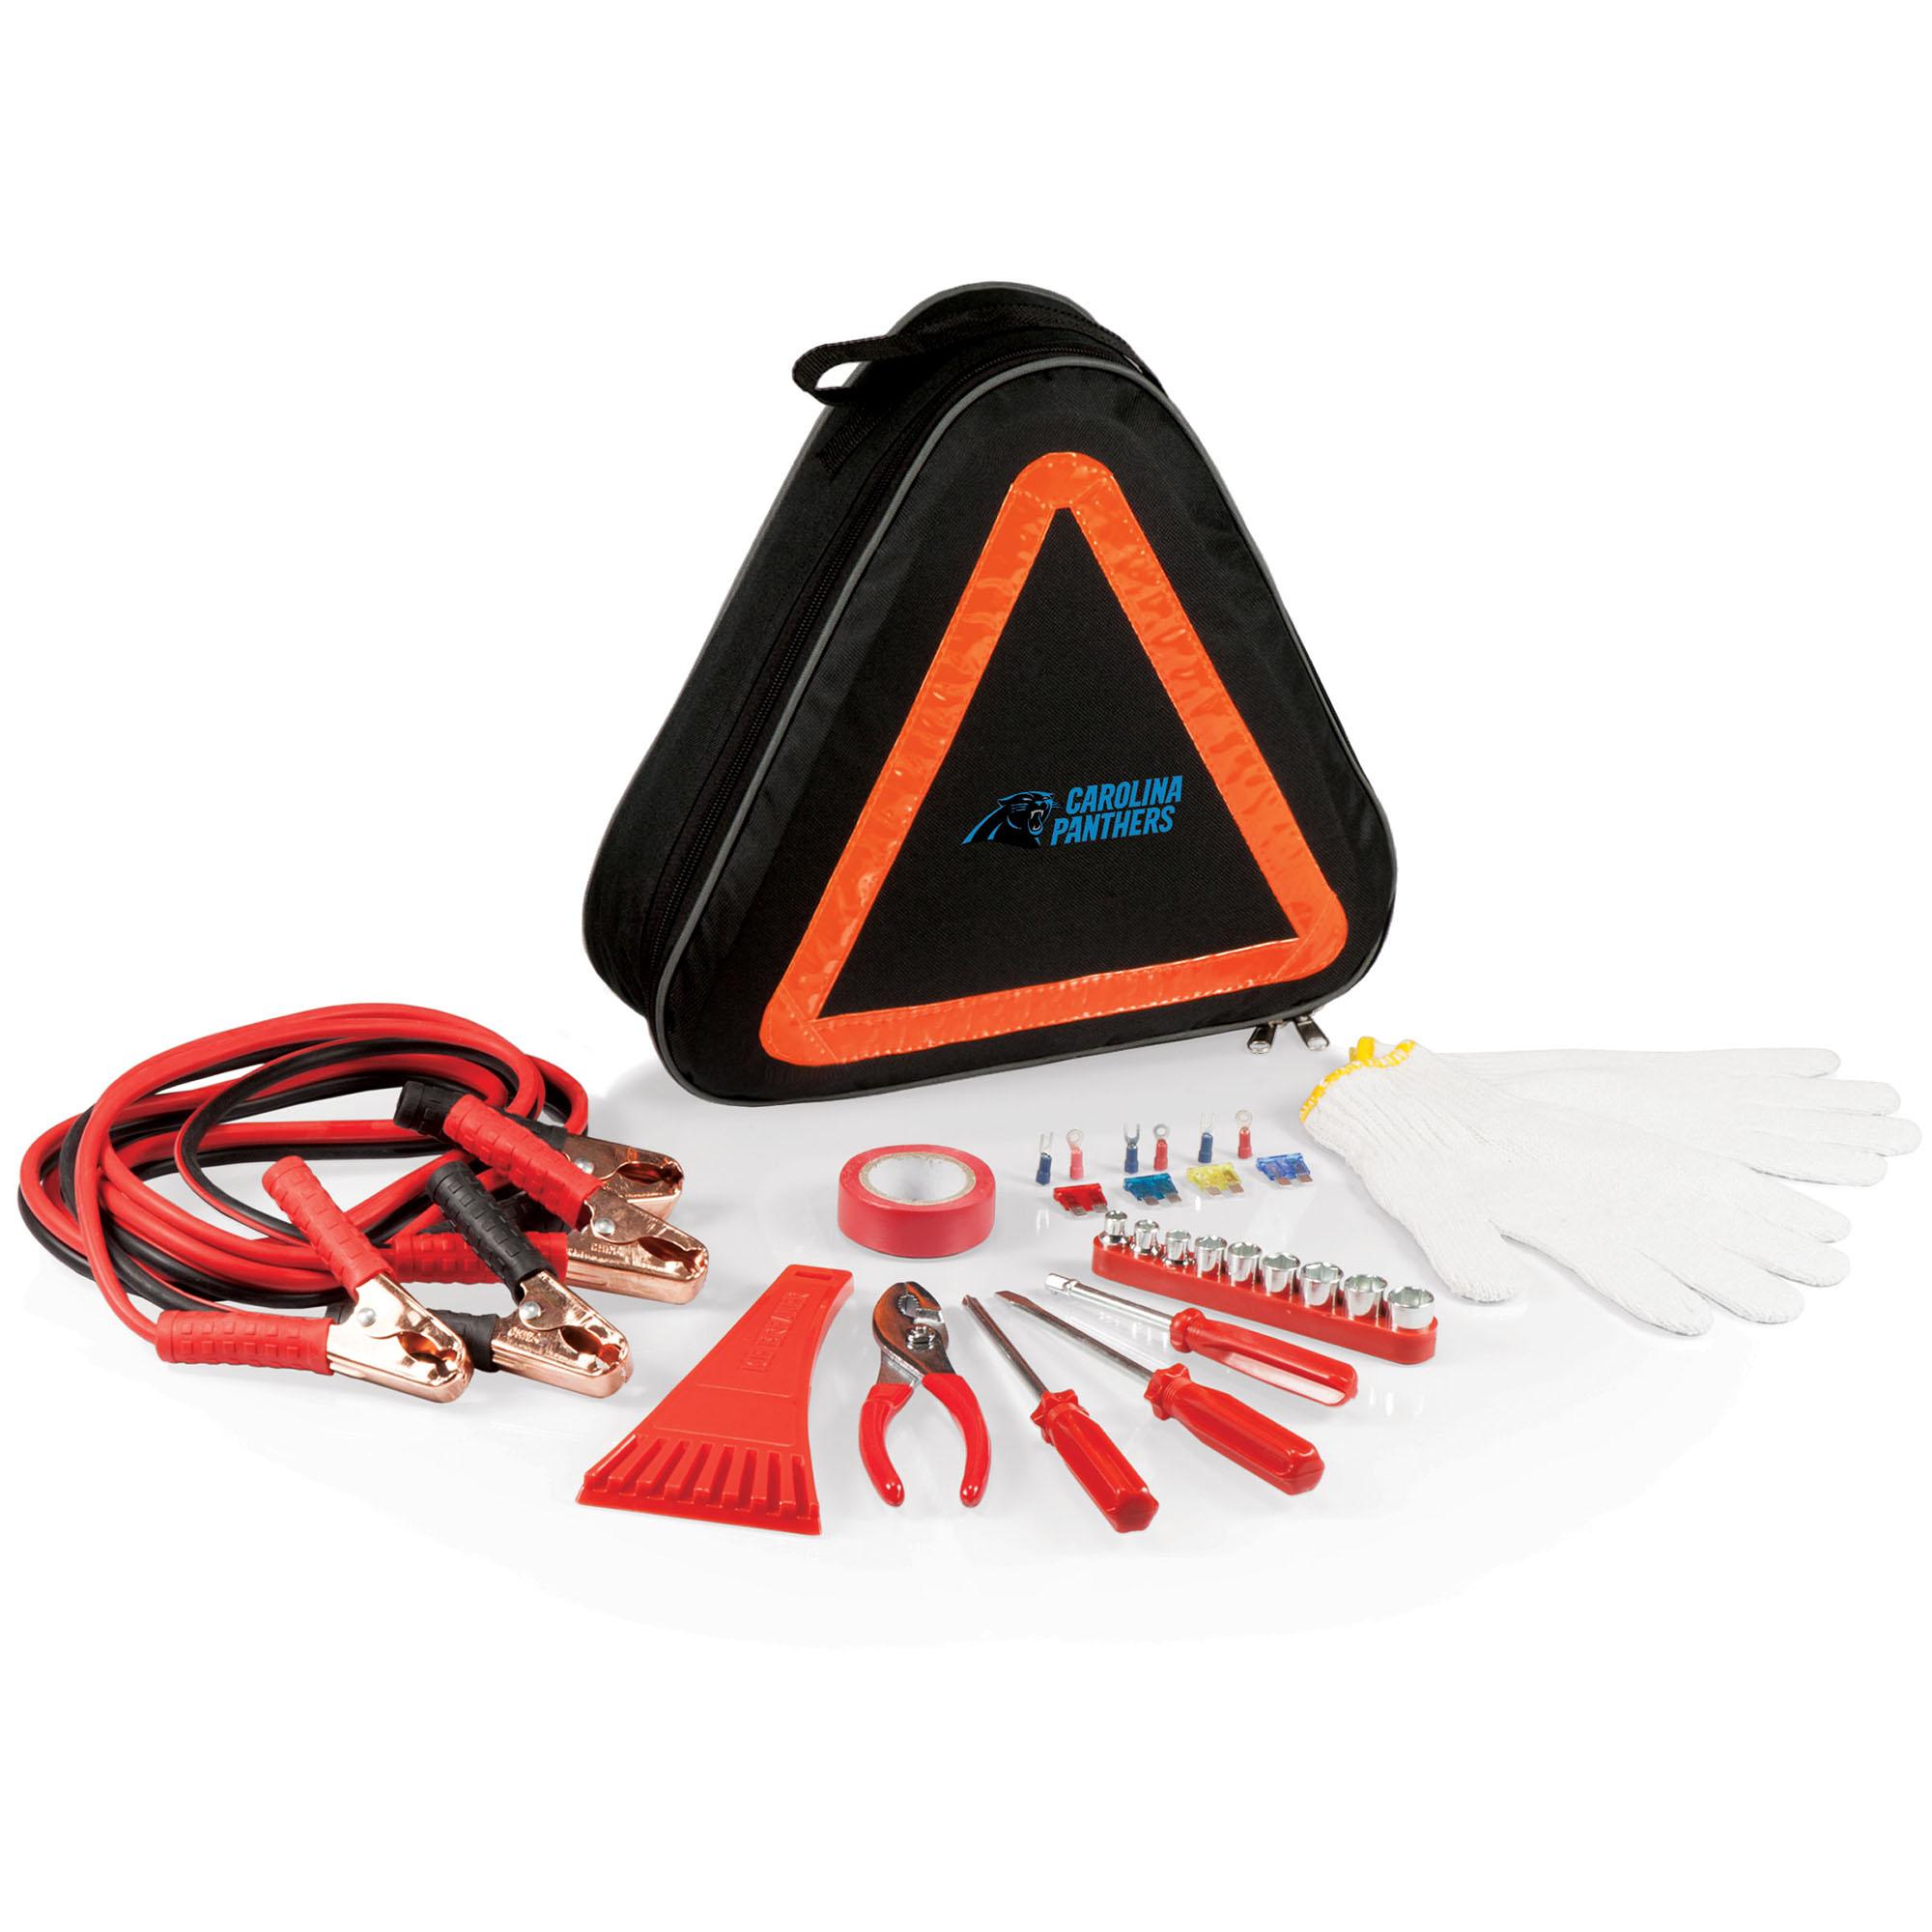 Carolina Panthers Roadside Emergency Kit - No Size